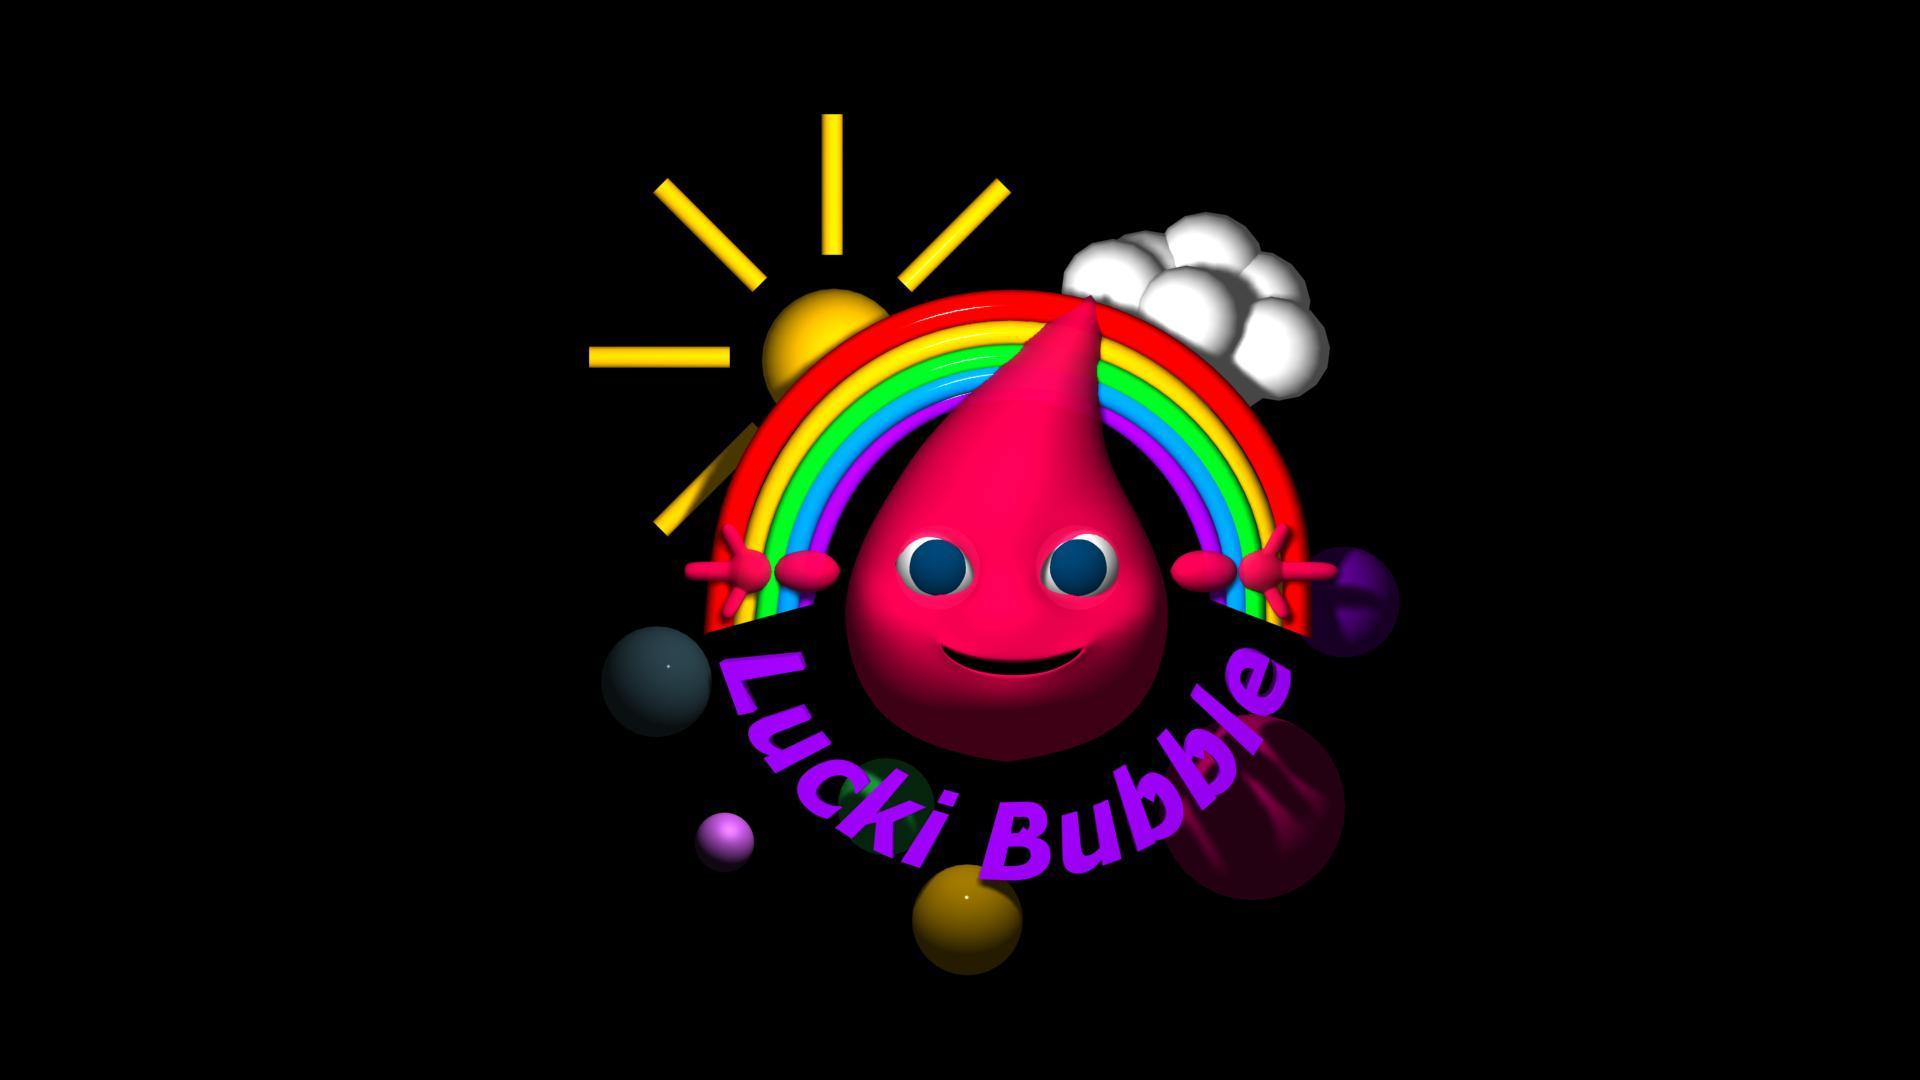 Разработка логотипа  фото f_1705fb59388b5bc8.jpg